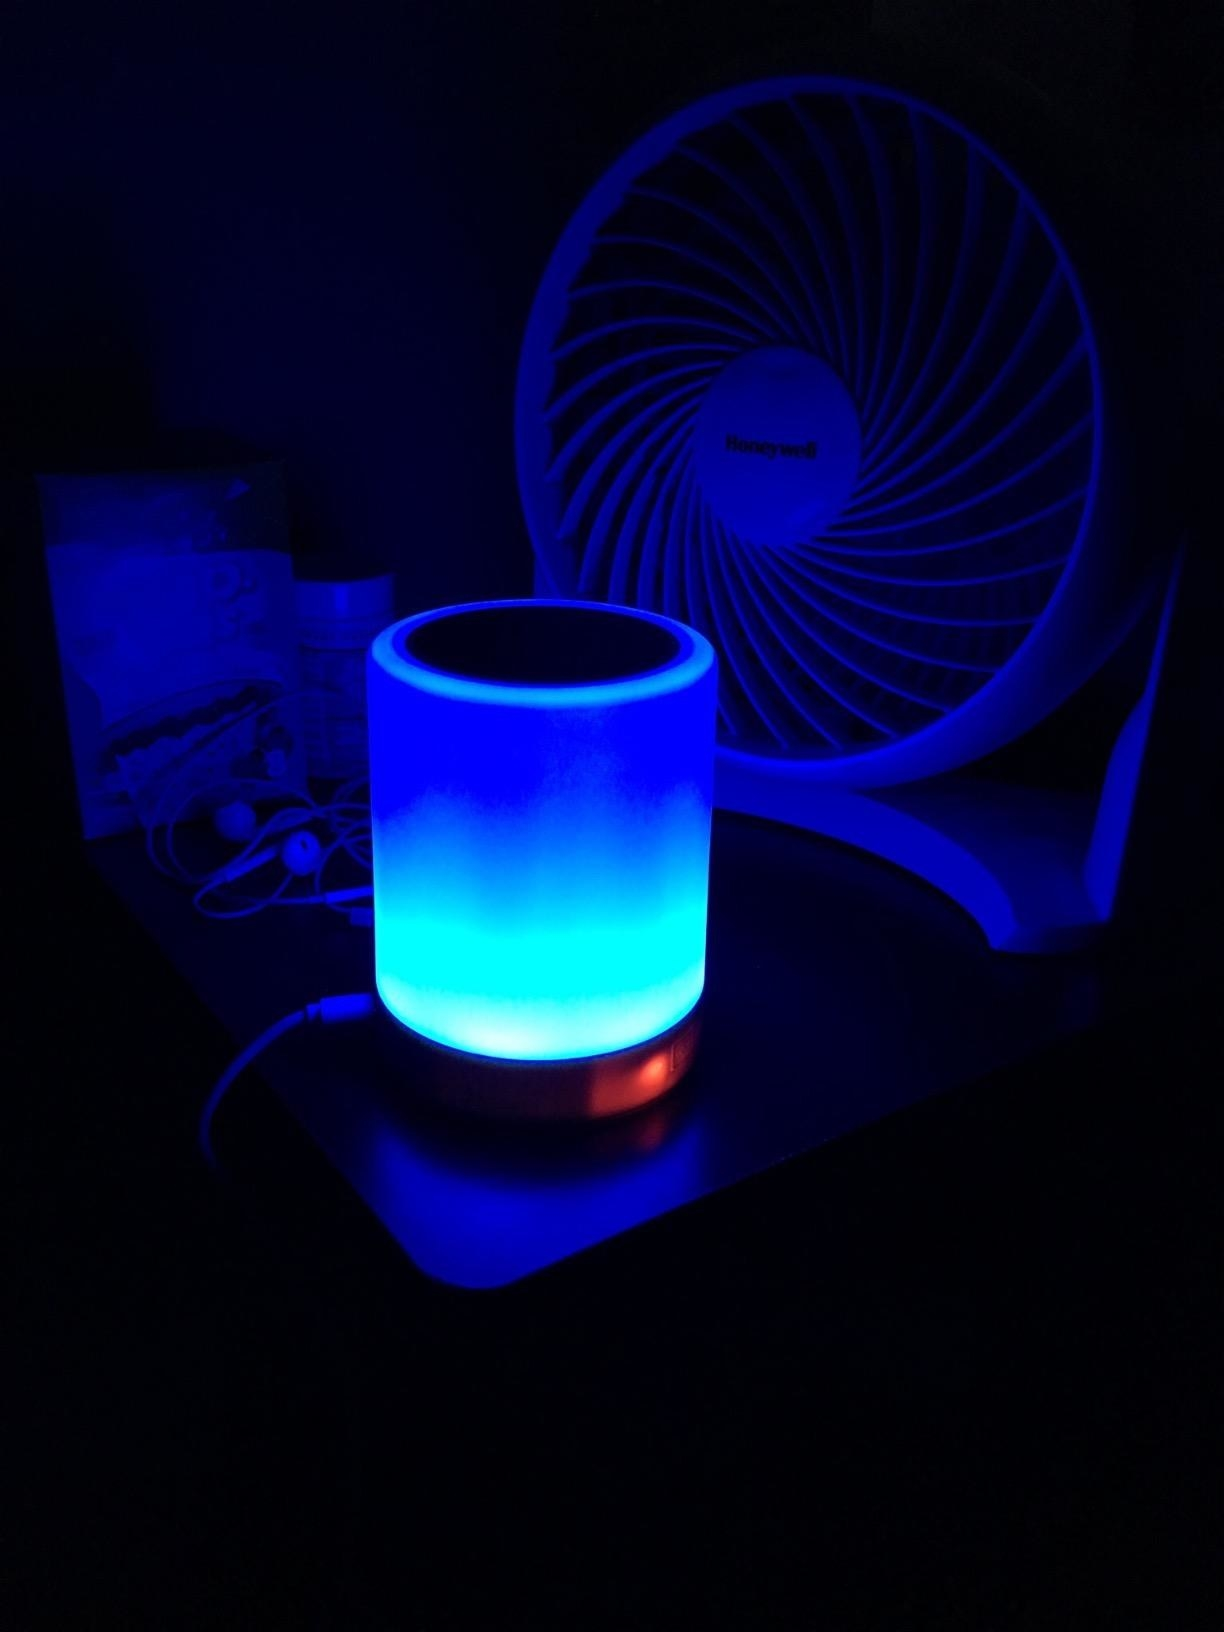 A reviewer's speaker glowing blue